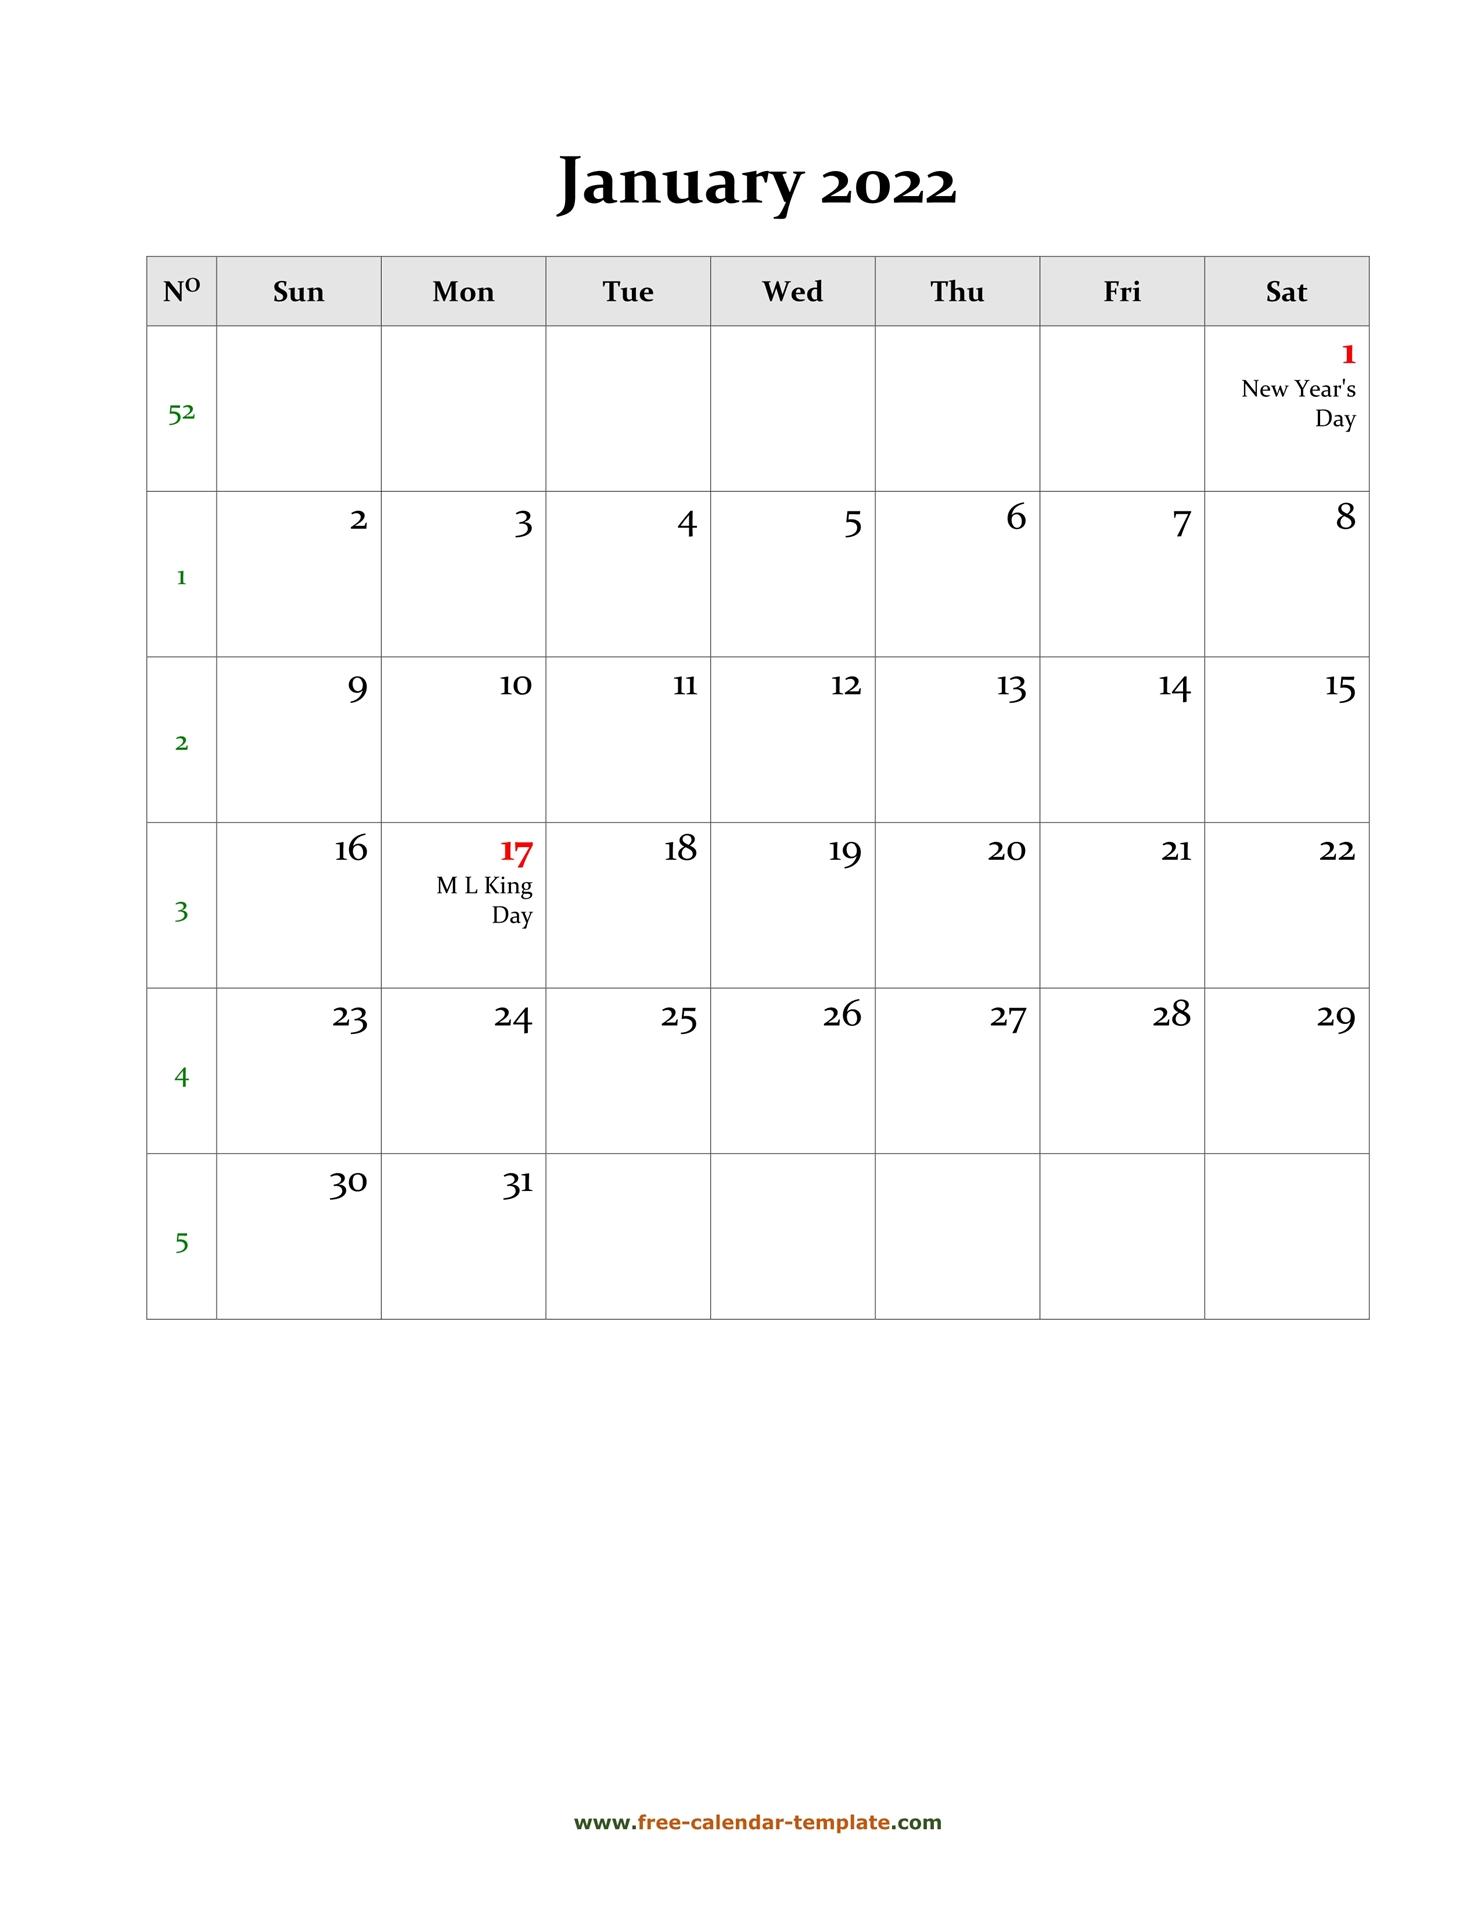 2022 January Calendar (Blank Vertical Template) | Free Within January2022 Printable Calendar Cute